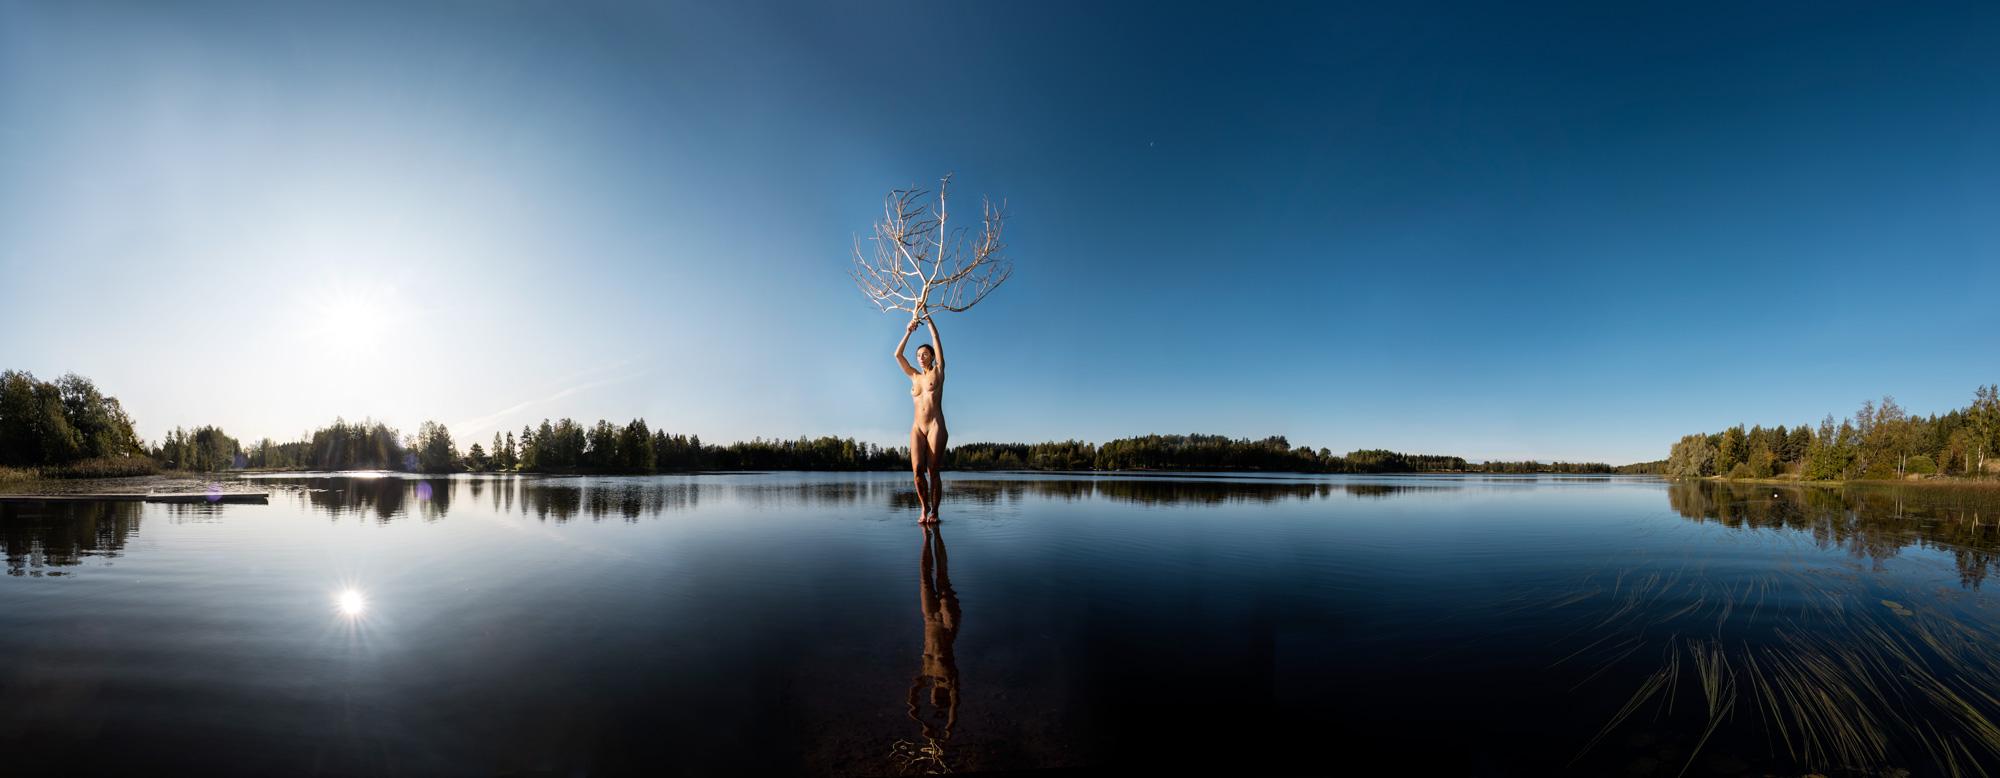 KÄÄNNA JUURI XI. Fotografía y retoque digital. Lago Mustianoja, Hämeenkyrö, Finlandia